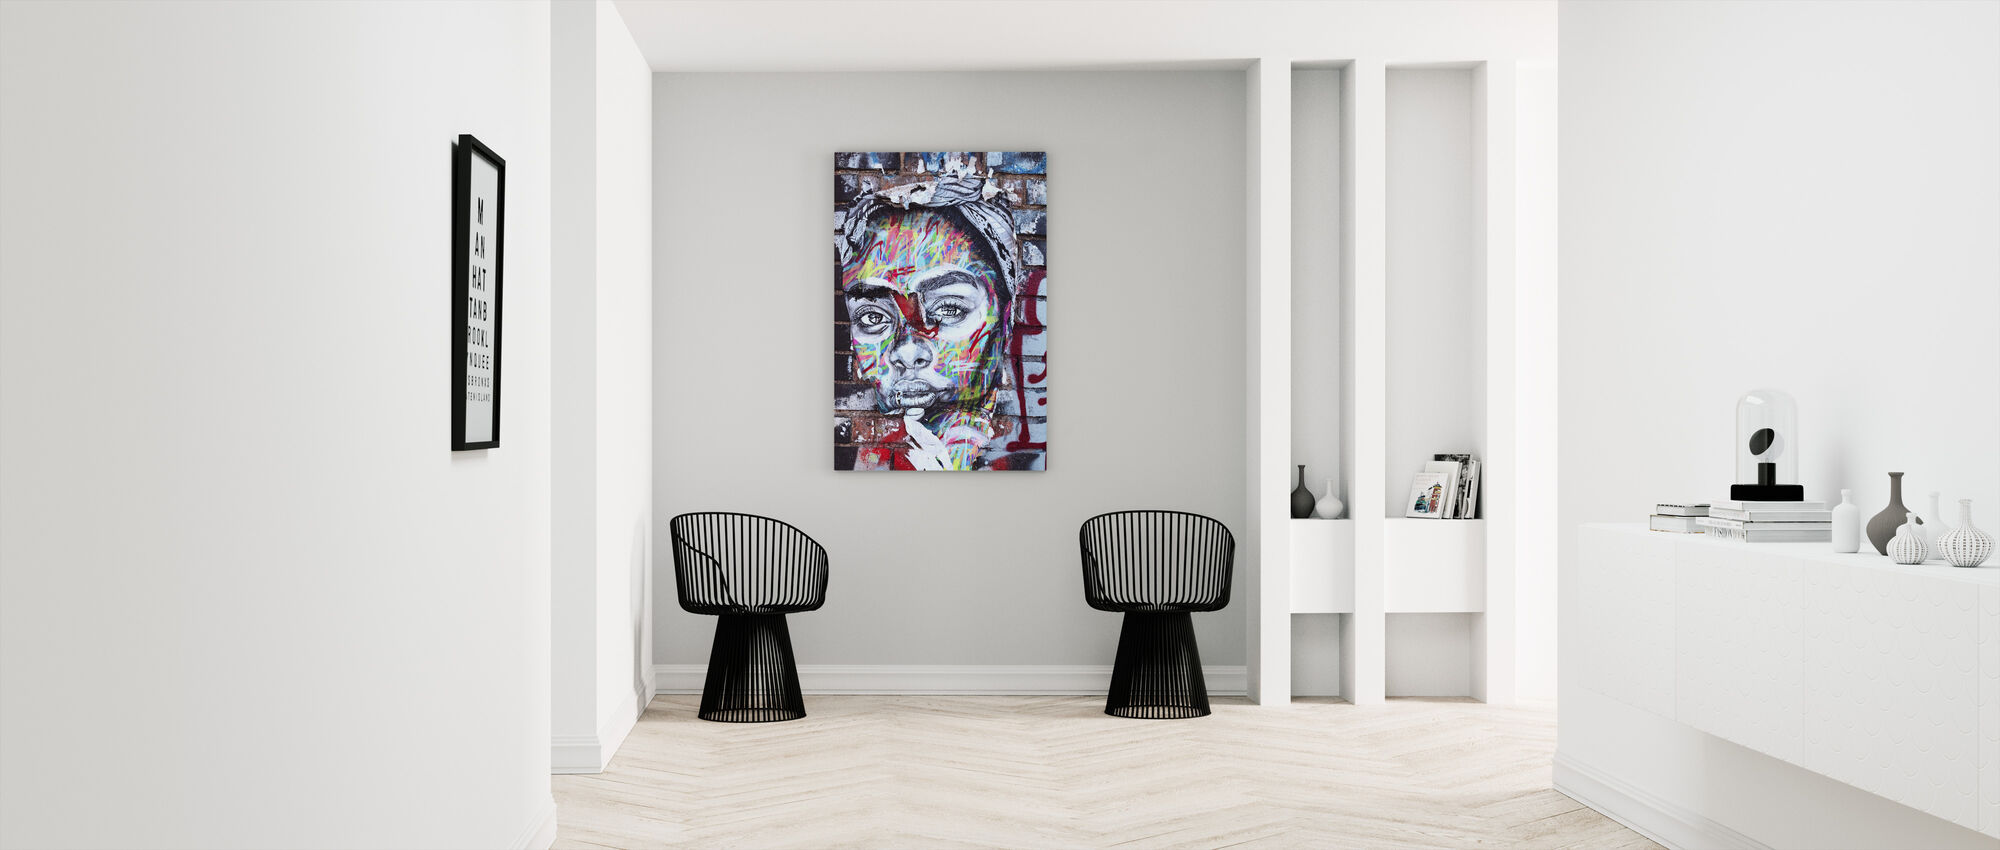 Straat Art Portret - Canvas print - Gang